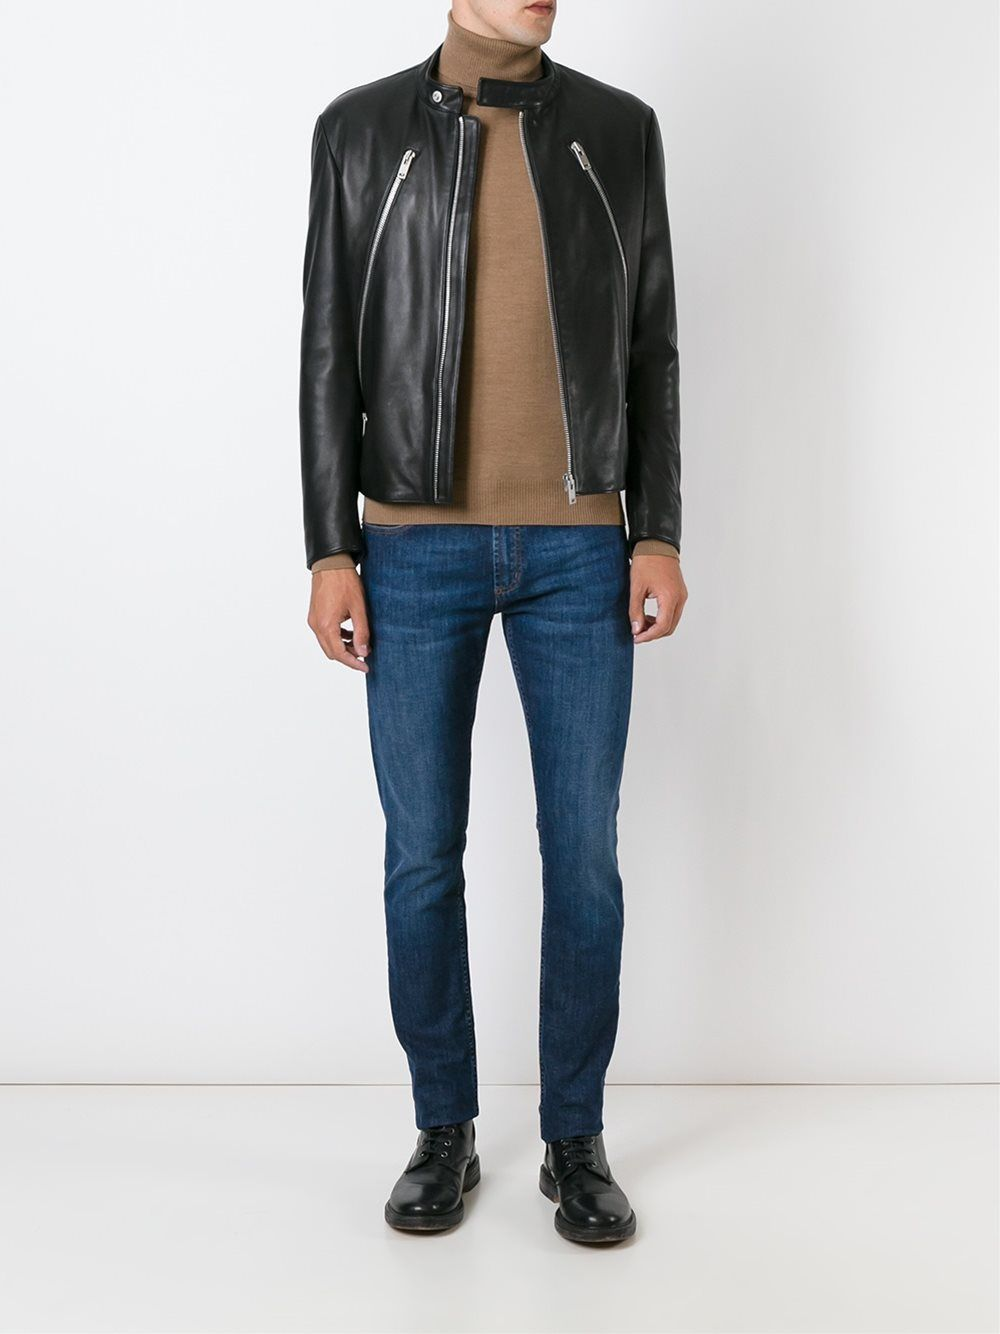 New Men's Genuine Lambskin Leather Jacket  Slim fit Biker Motorcycle jacket-G22